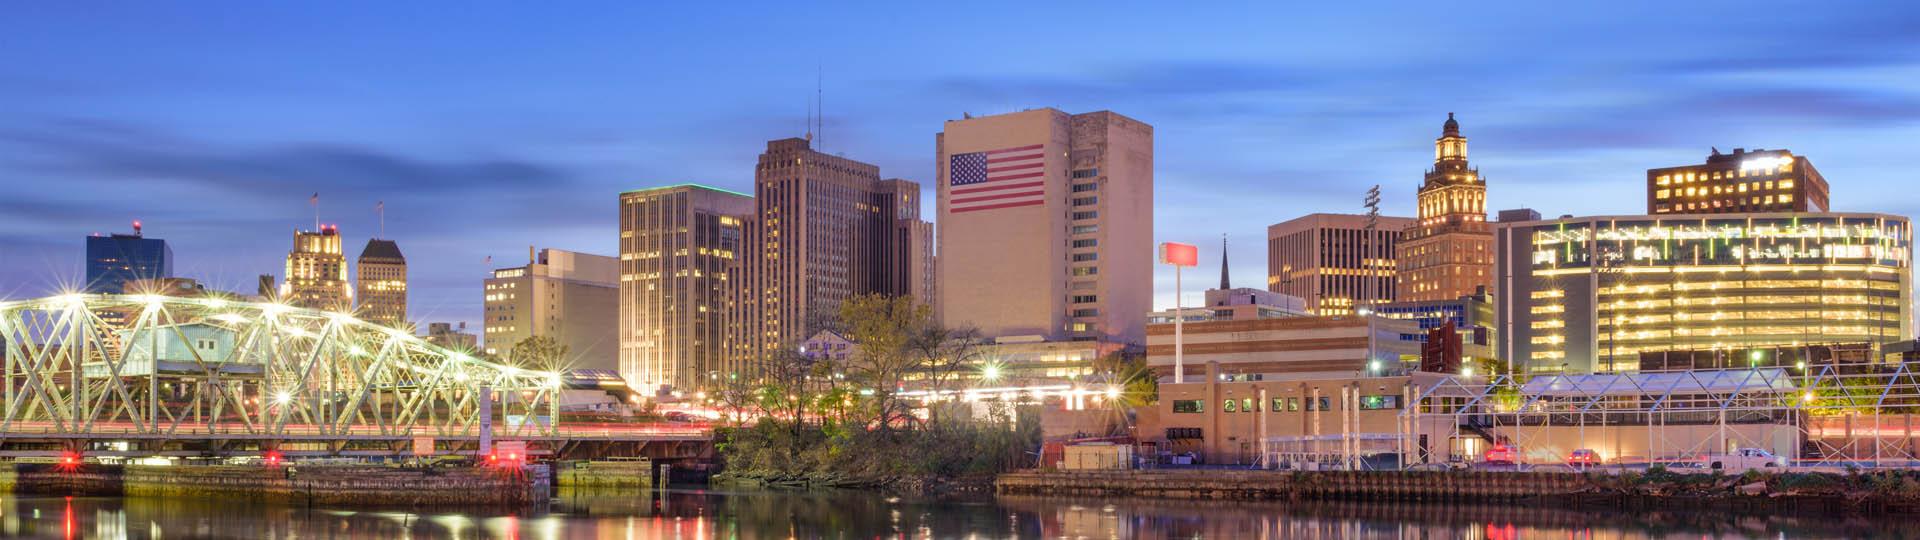 Investors In Newark, New Jersey